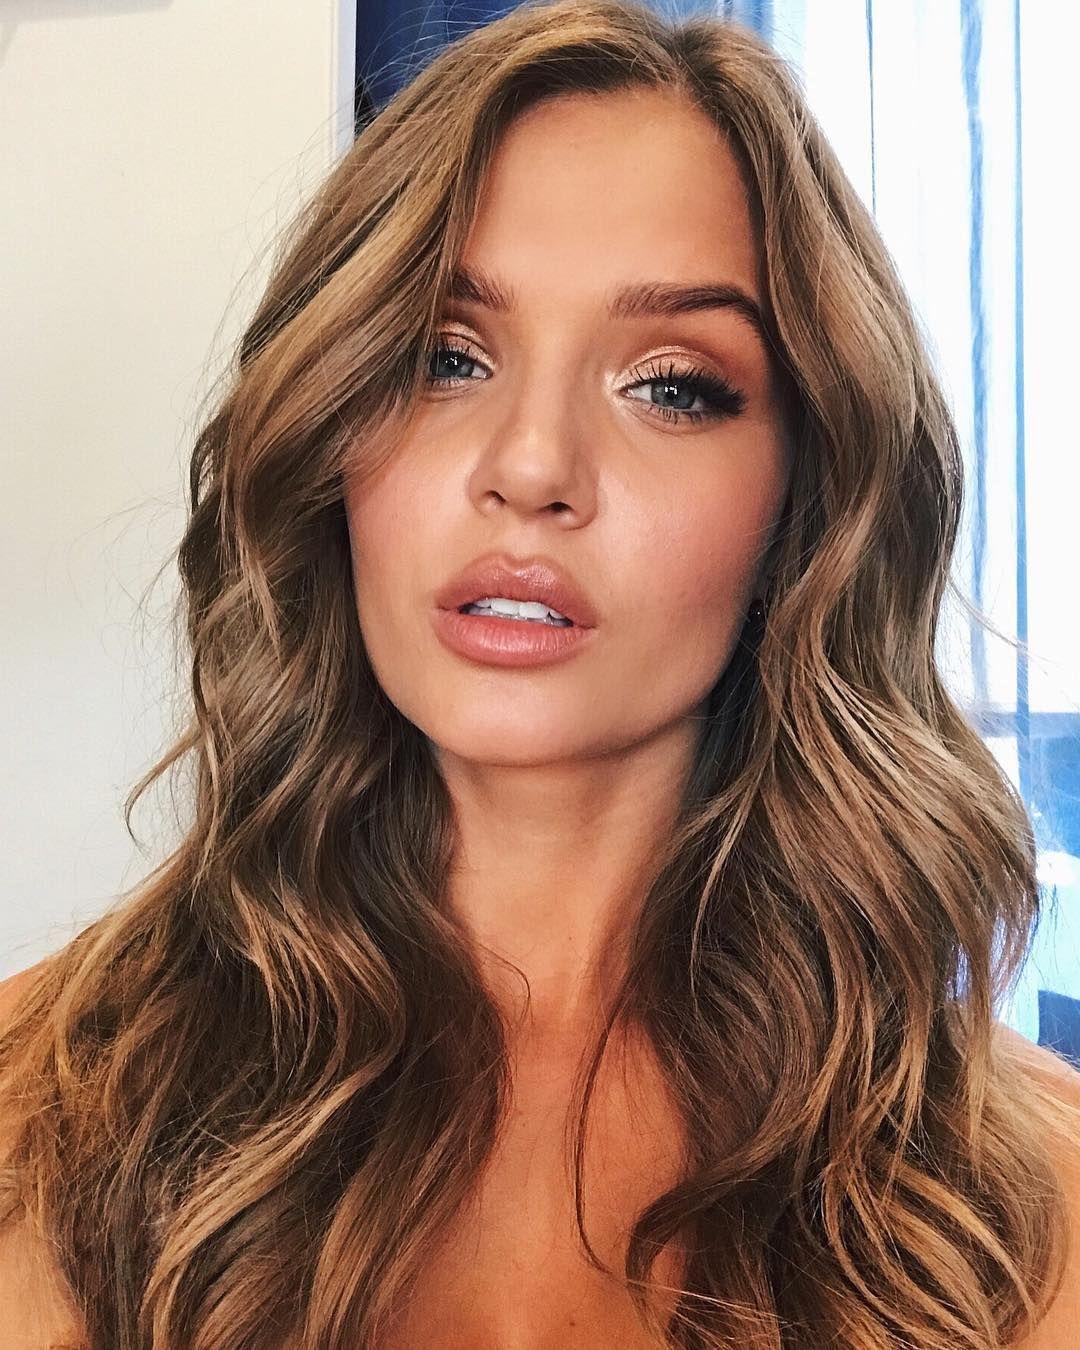 Victoria S Secret Angels Reveal Their Essential Post Show Skin Hair Care Tips Victorias Secret Model Hair Victoria Secret Hair Thin Hair Care